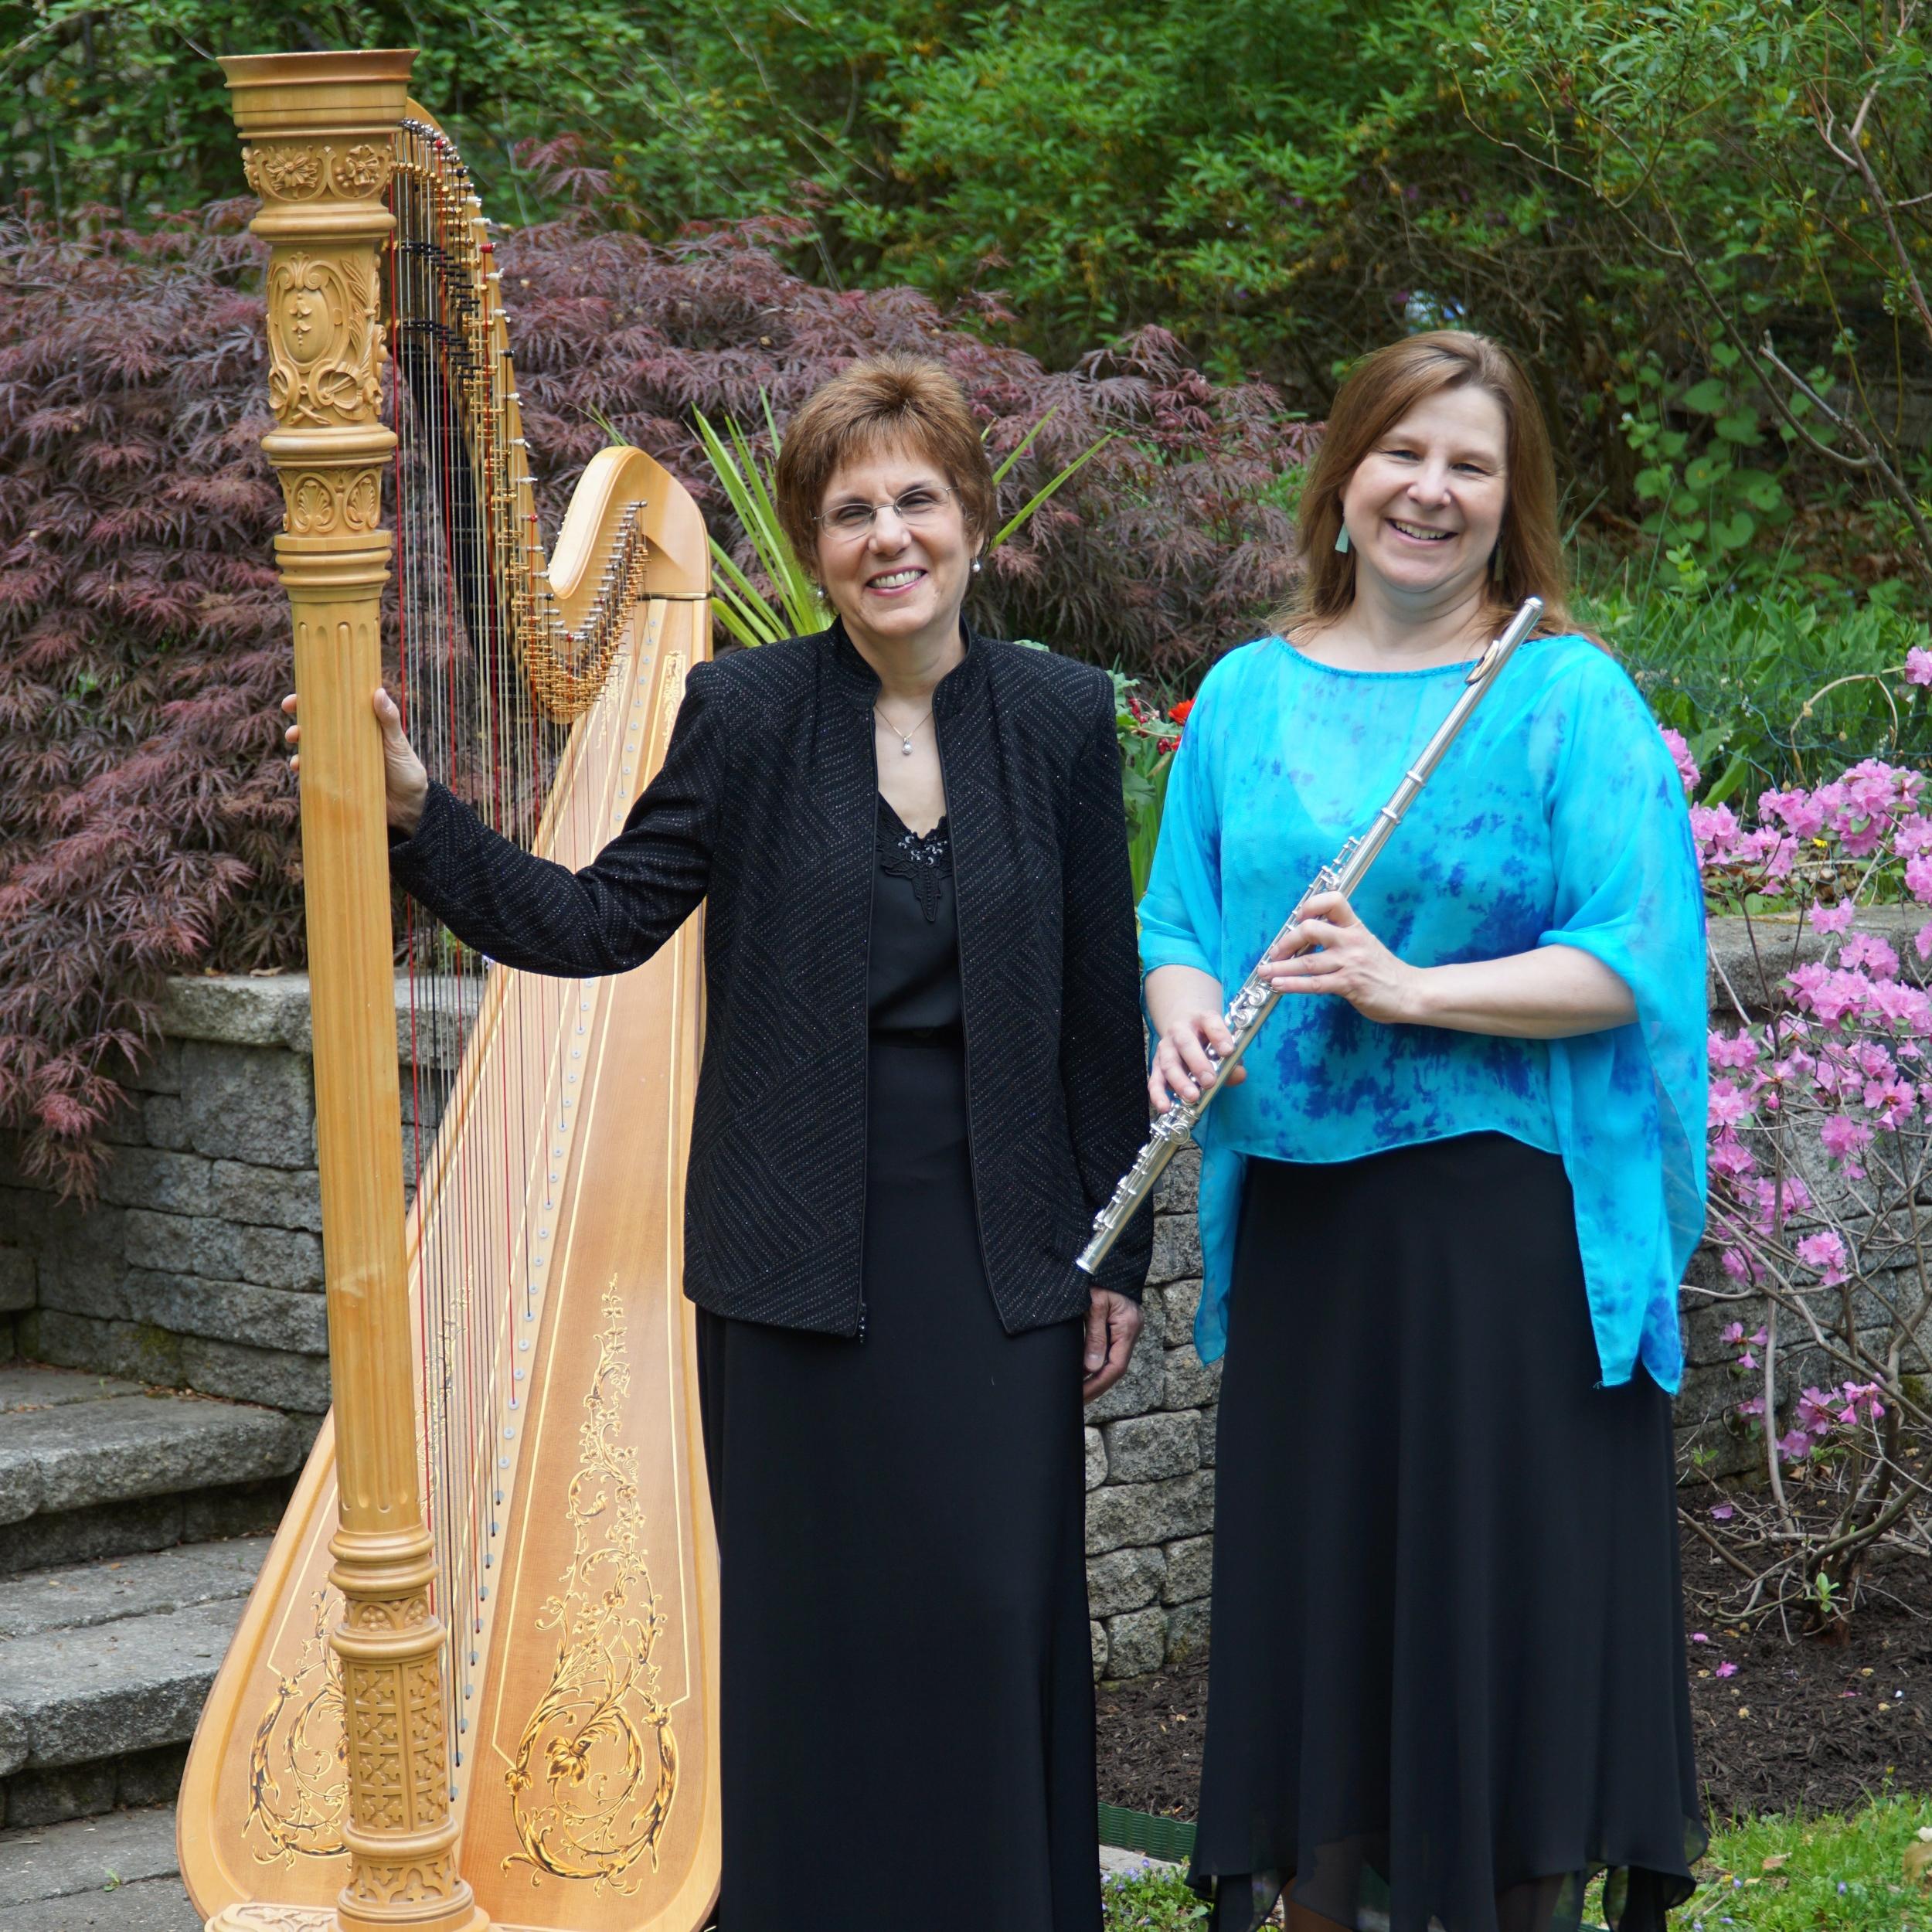 Lois Herbine and Sophie Labiner, 2015